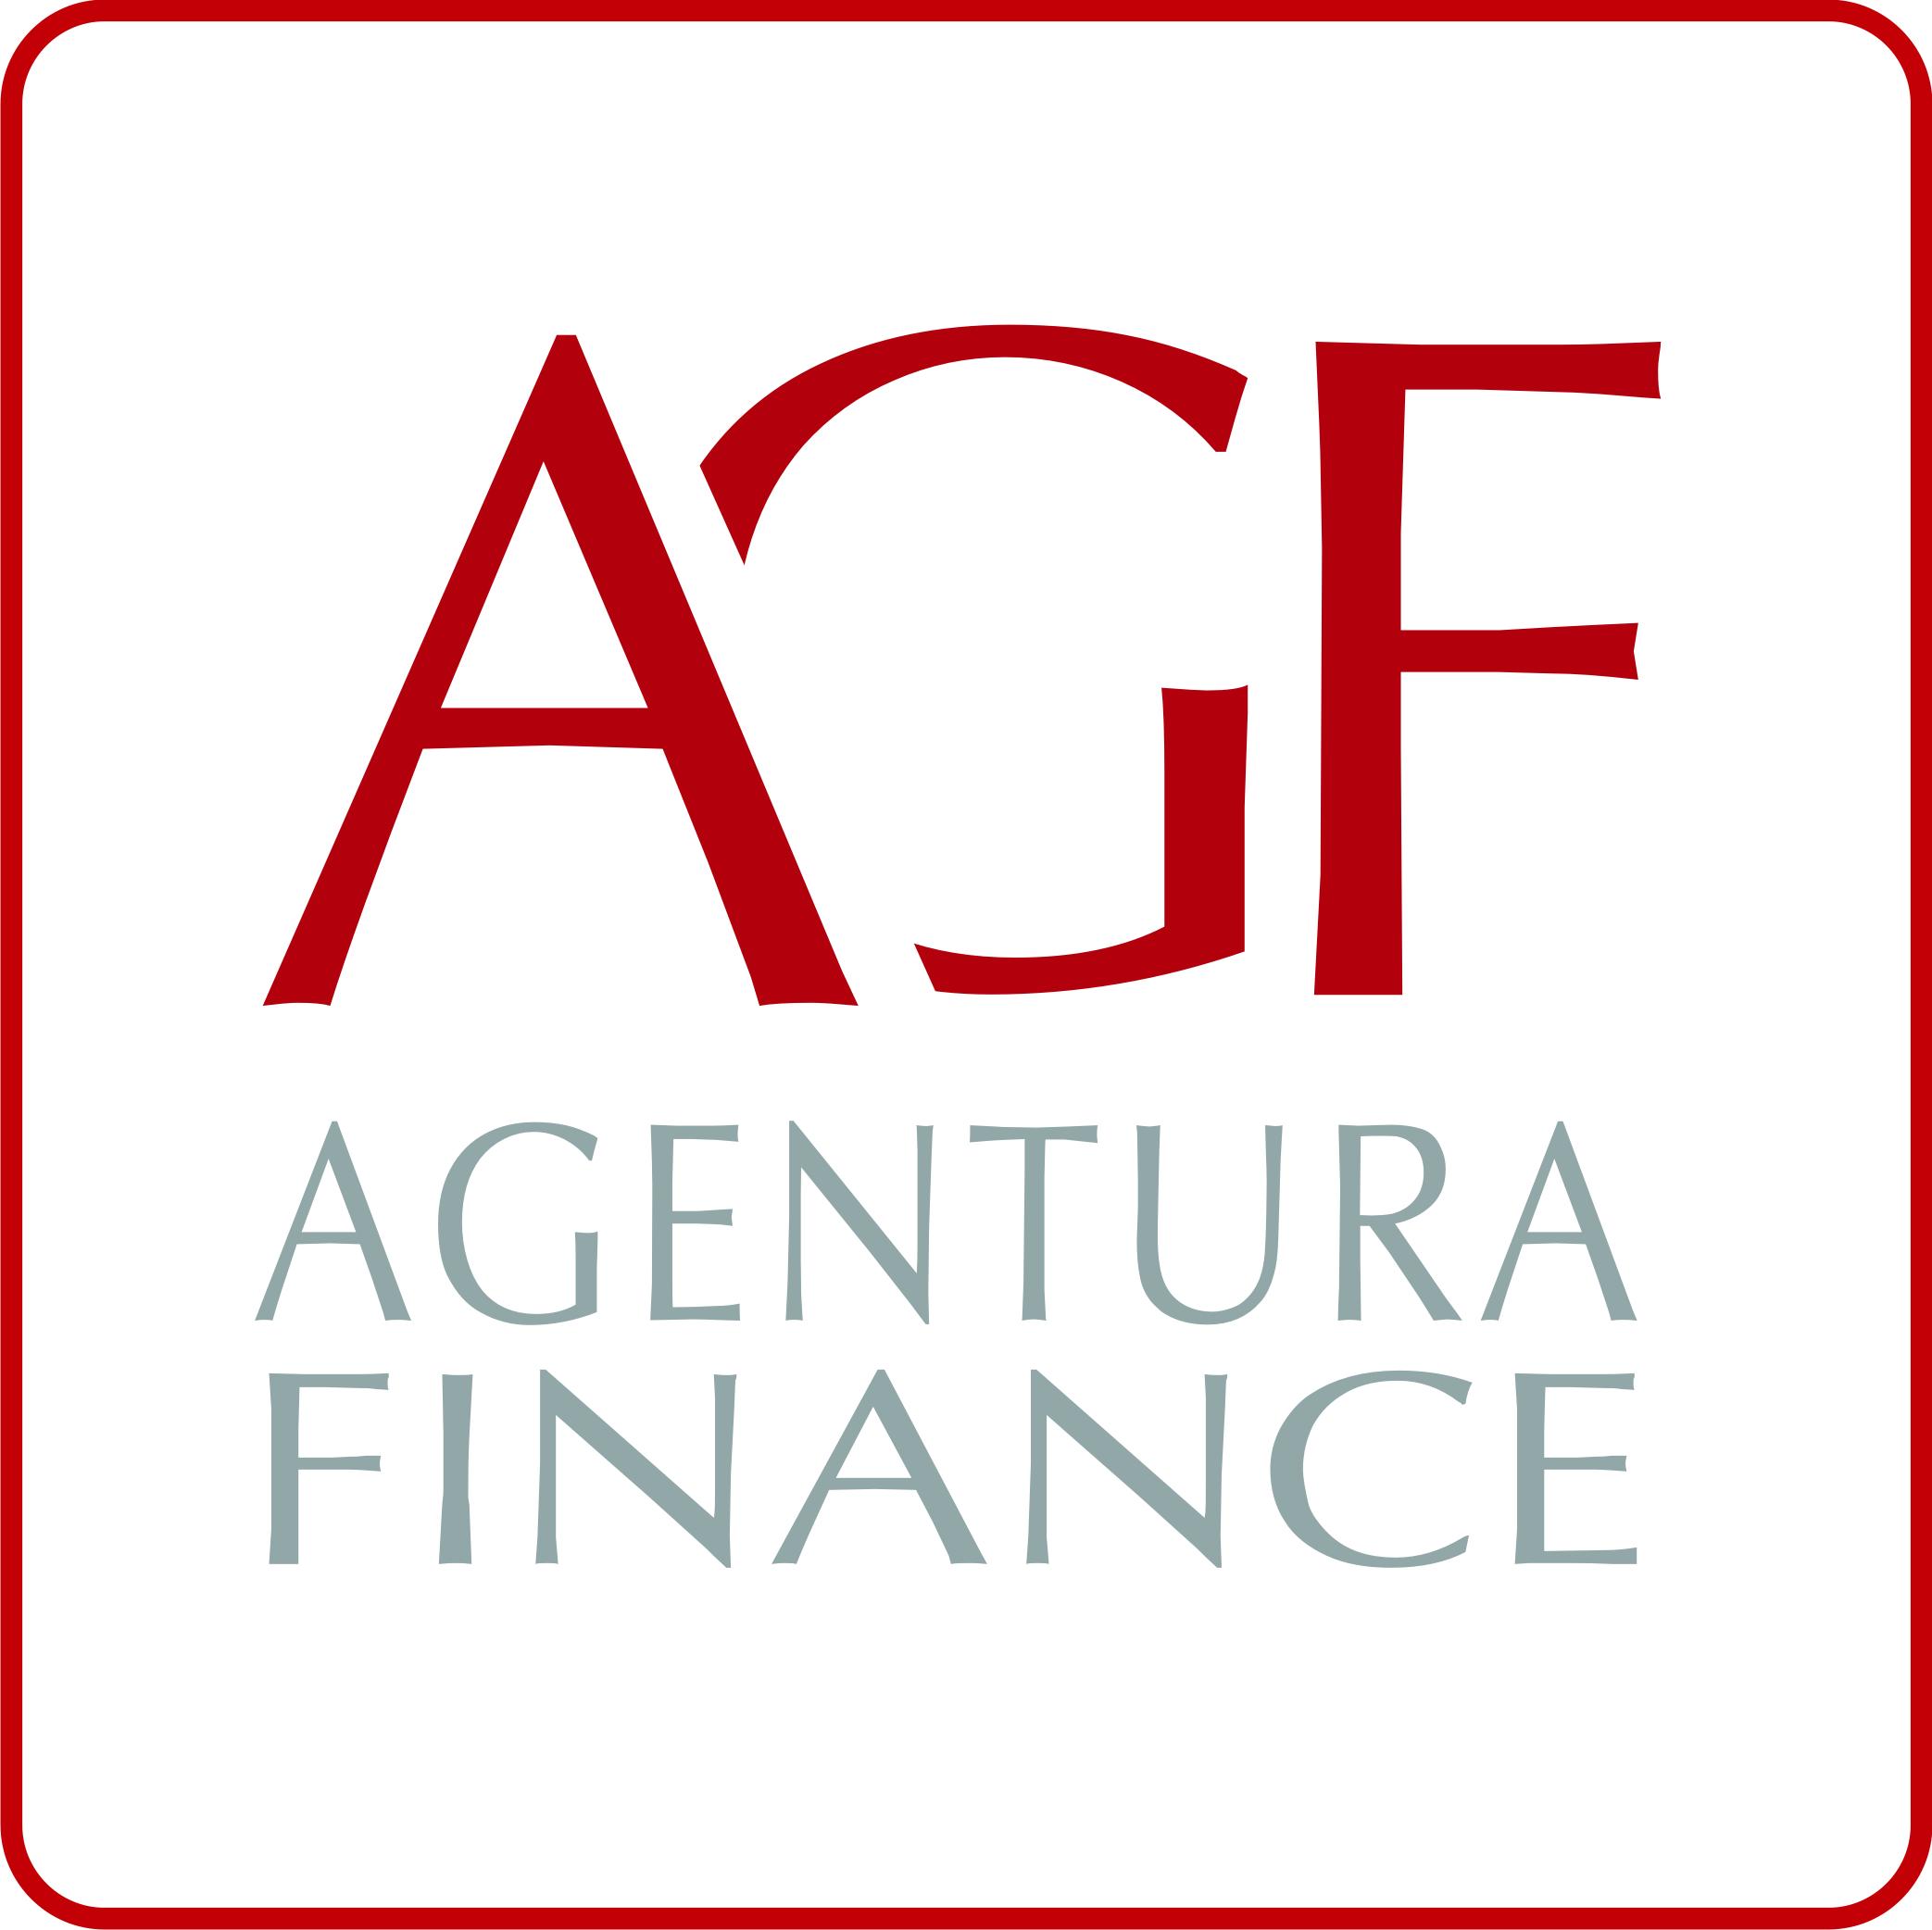 AGF Agentura Finance